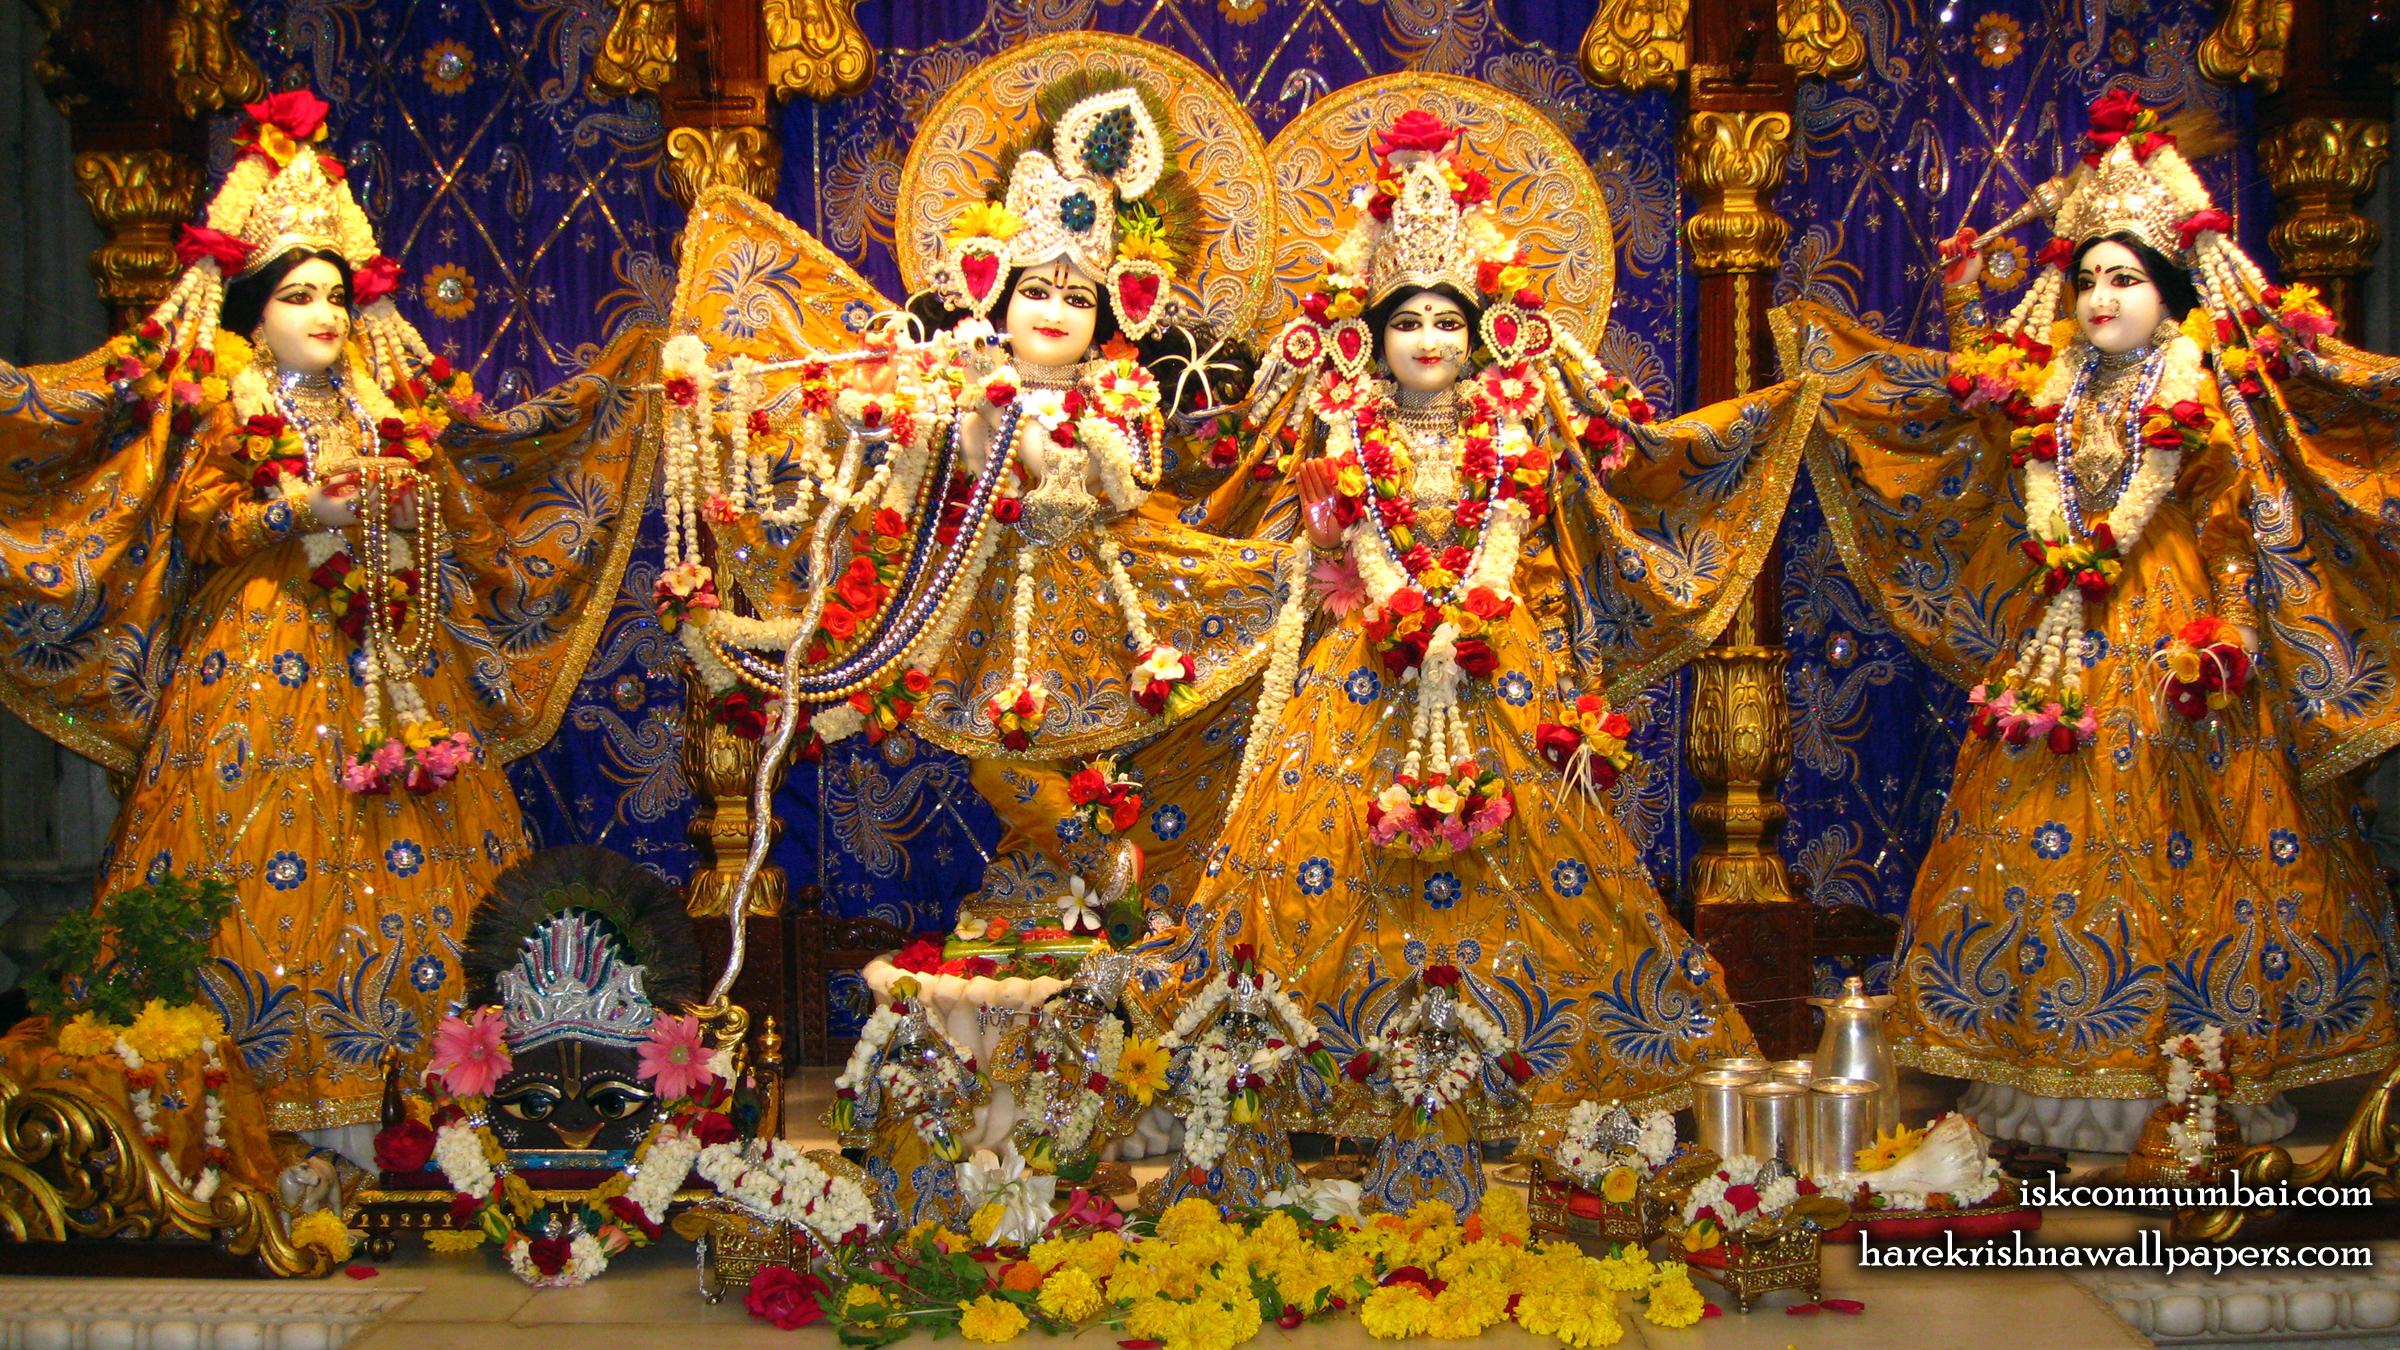 Sri Sri Radha Rasabihari Lalita Vishakha Wallpaper (005) Size 2400x1350 Download